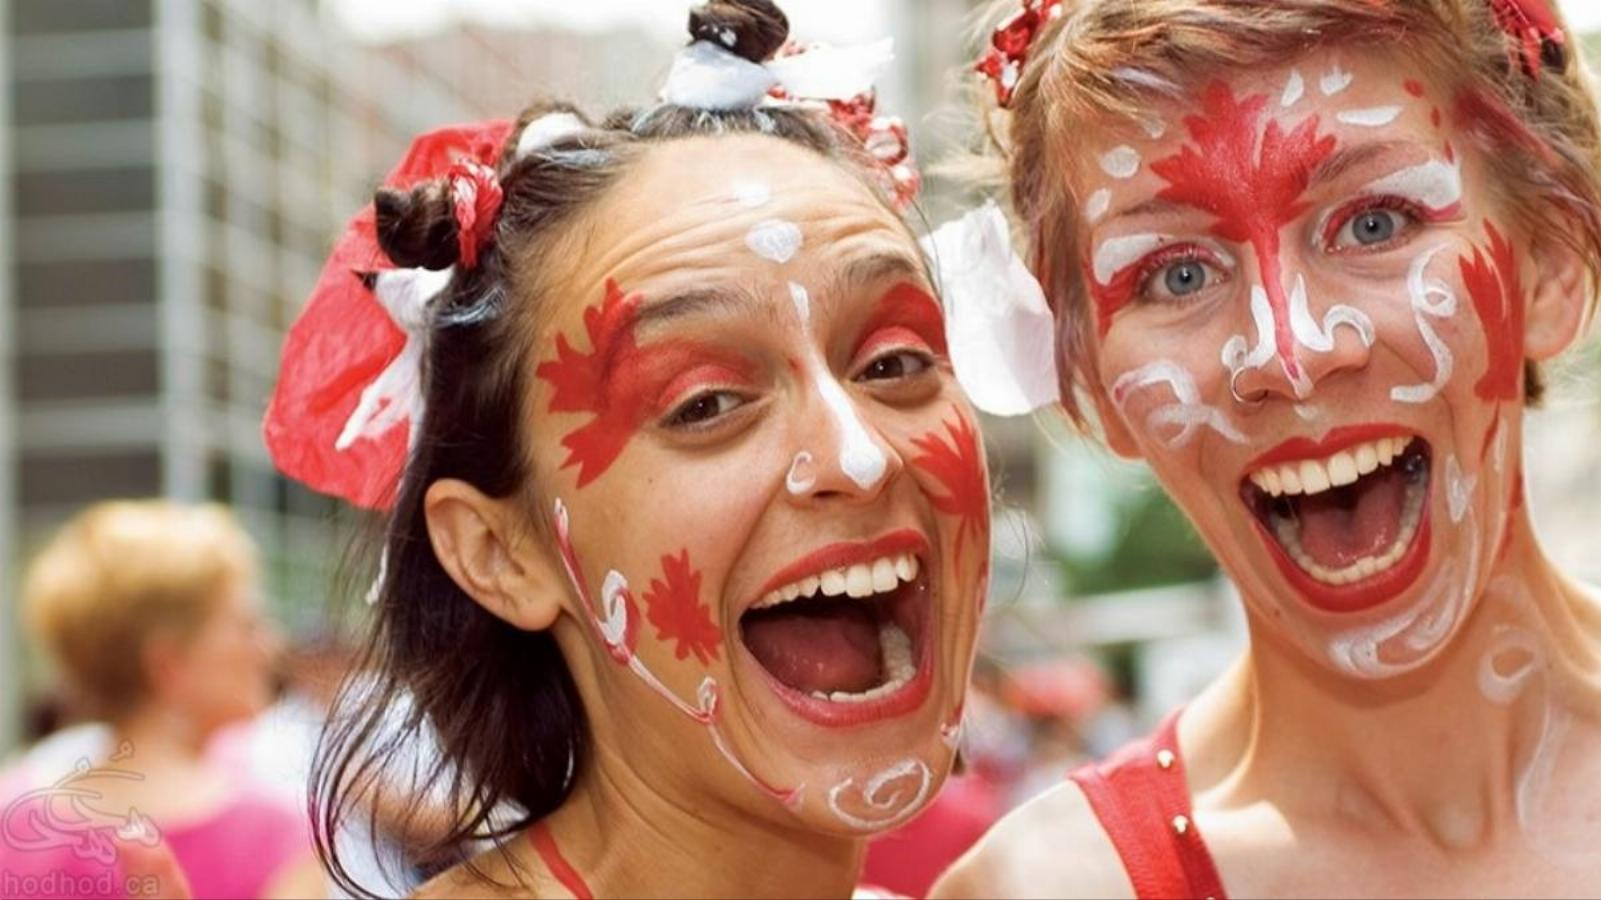 روز ملی کانادا و آلبوم تصاویر